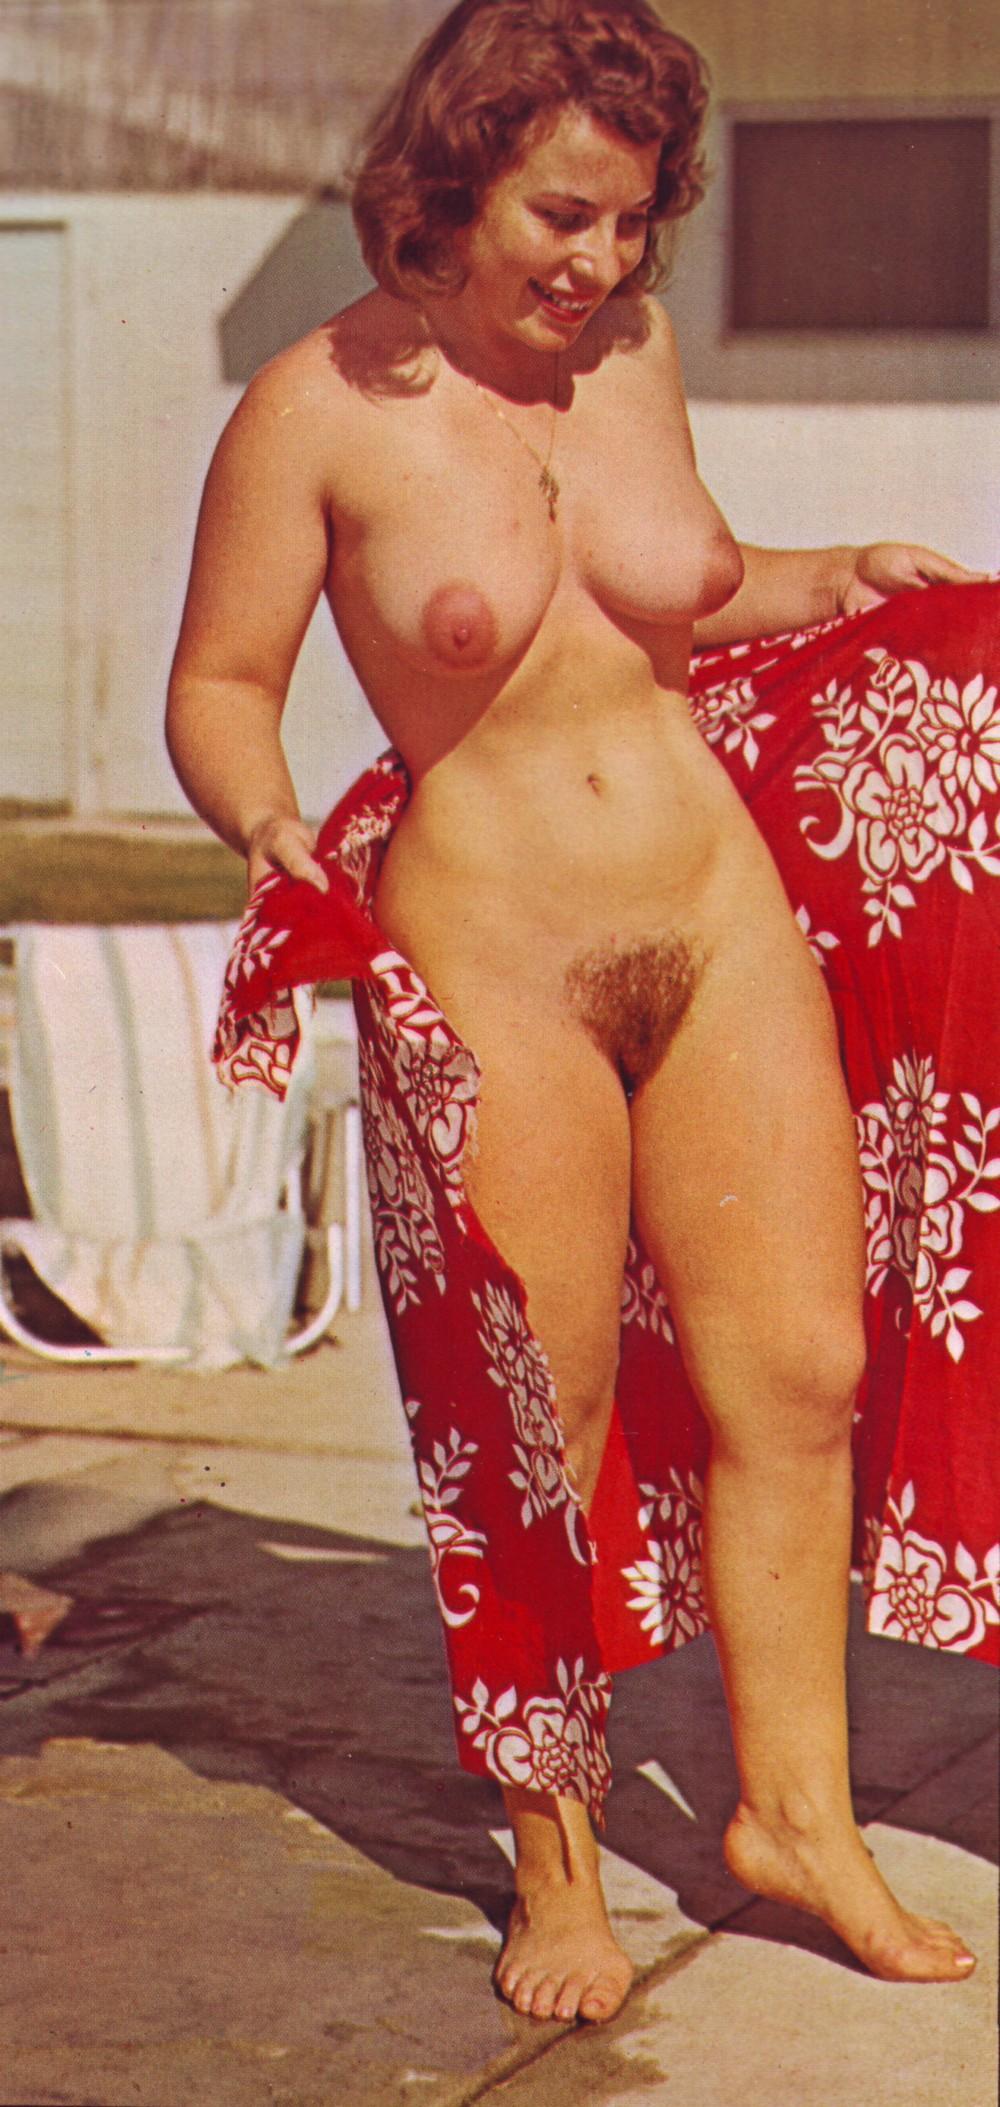 Retro nudist photos